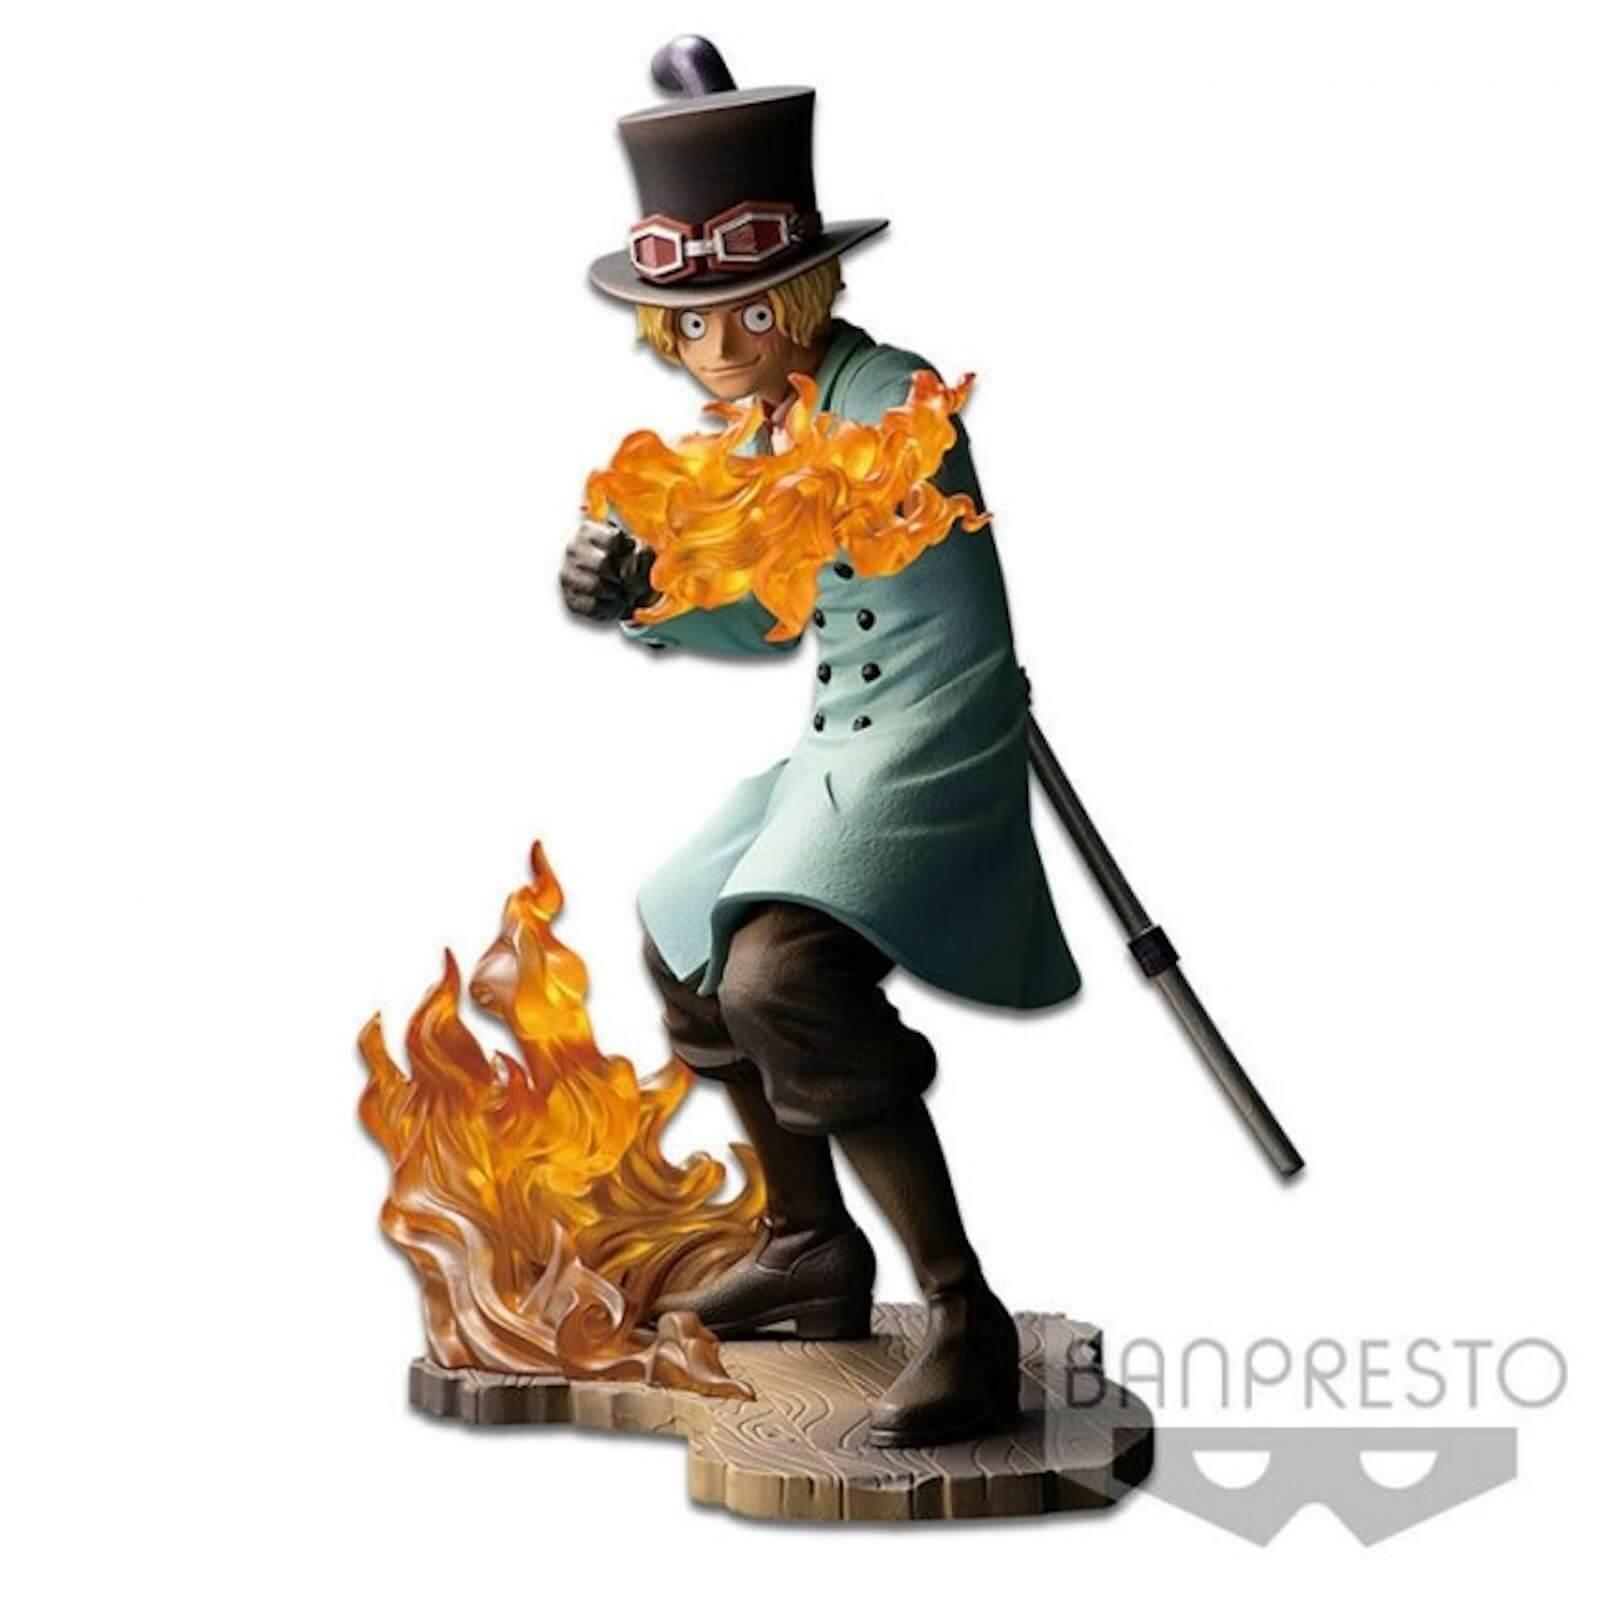 Image of Banpresto One Piece Stampede Movie Posing Vol. 1 Statue